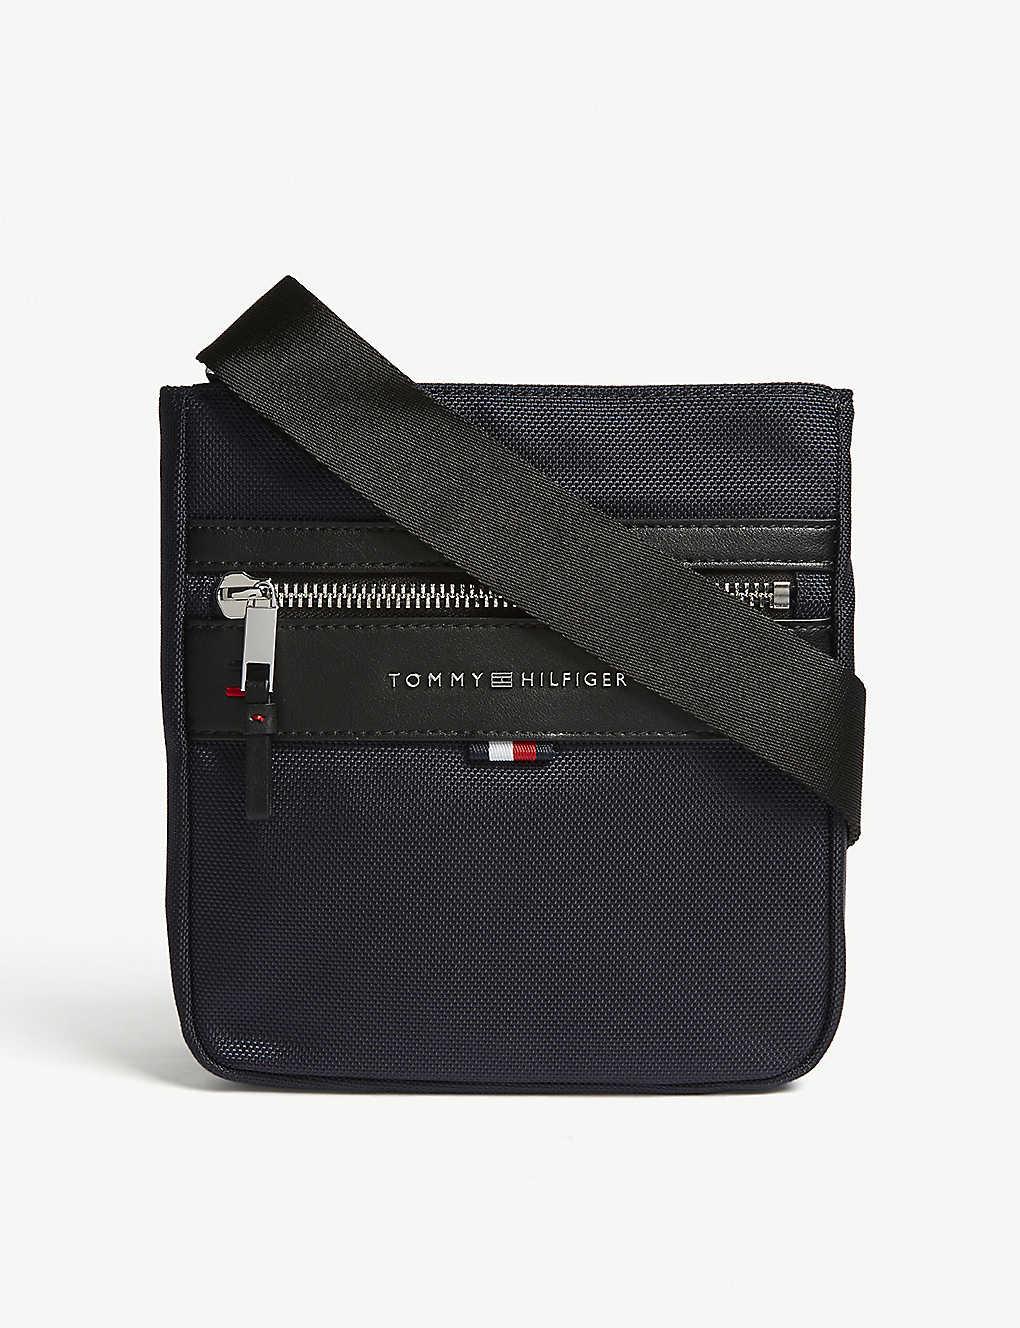 04a07b75074d9 TOMMY HILFIGER - Elevated Mini Reporter crossbody bag